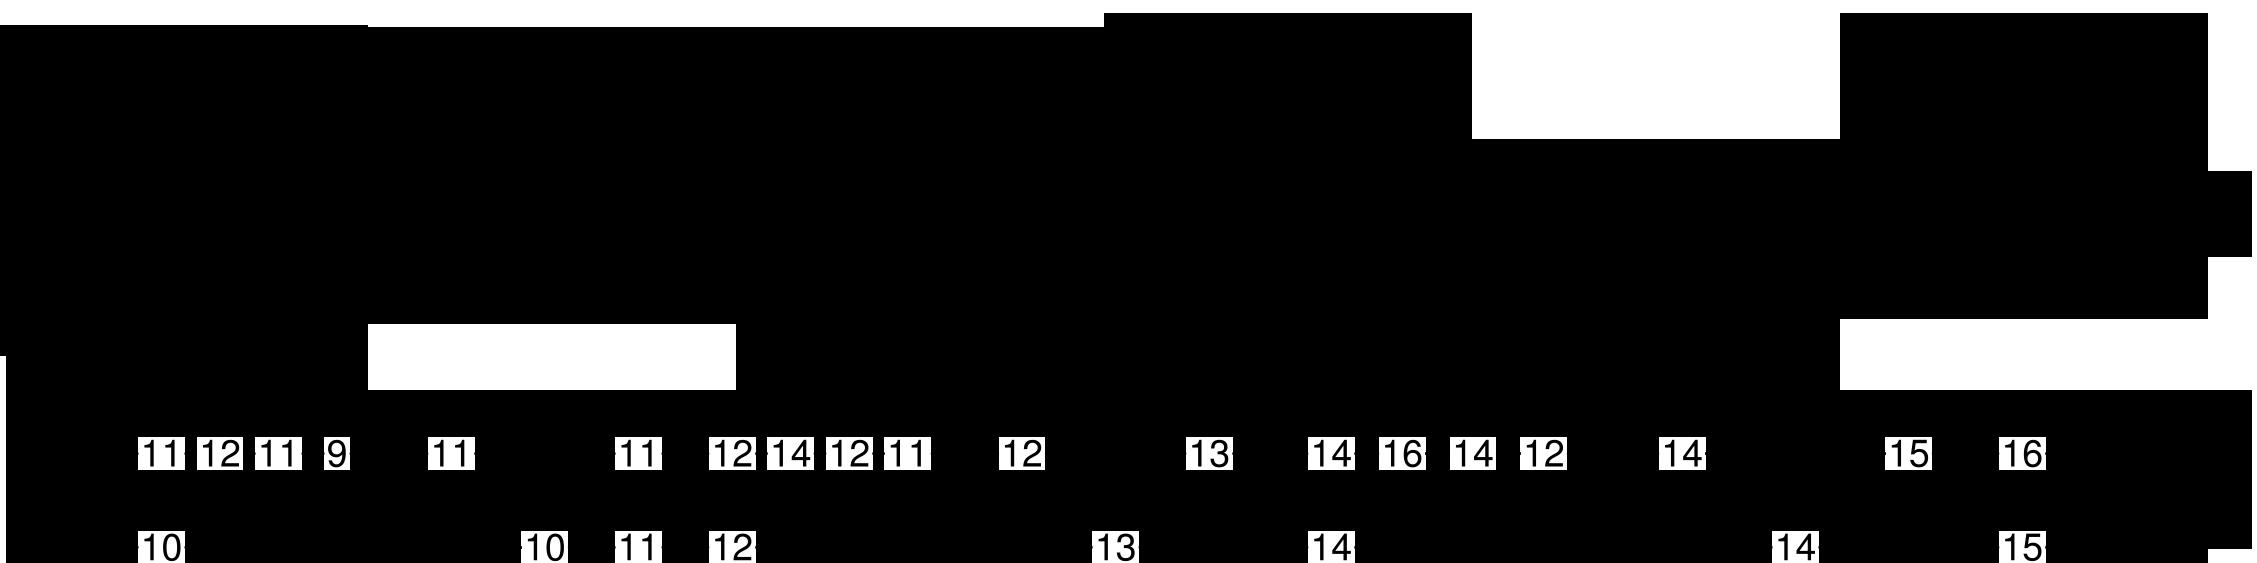 Martin Taylor Chord Melody Example 2e 1